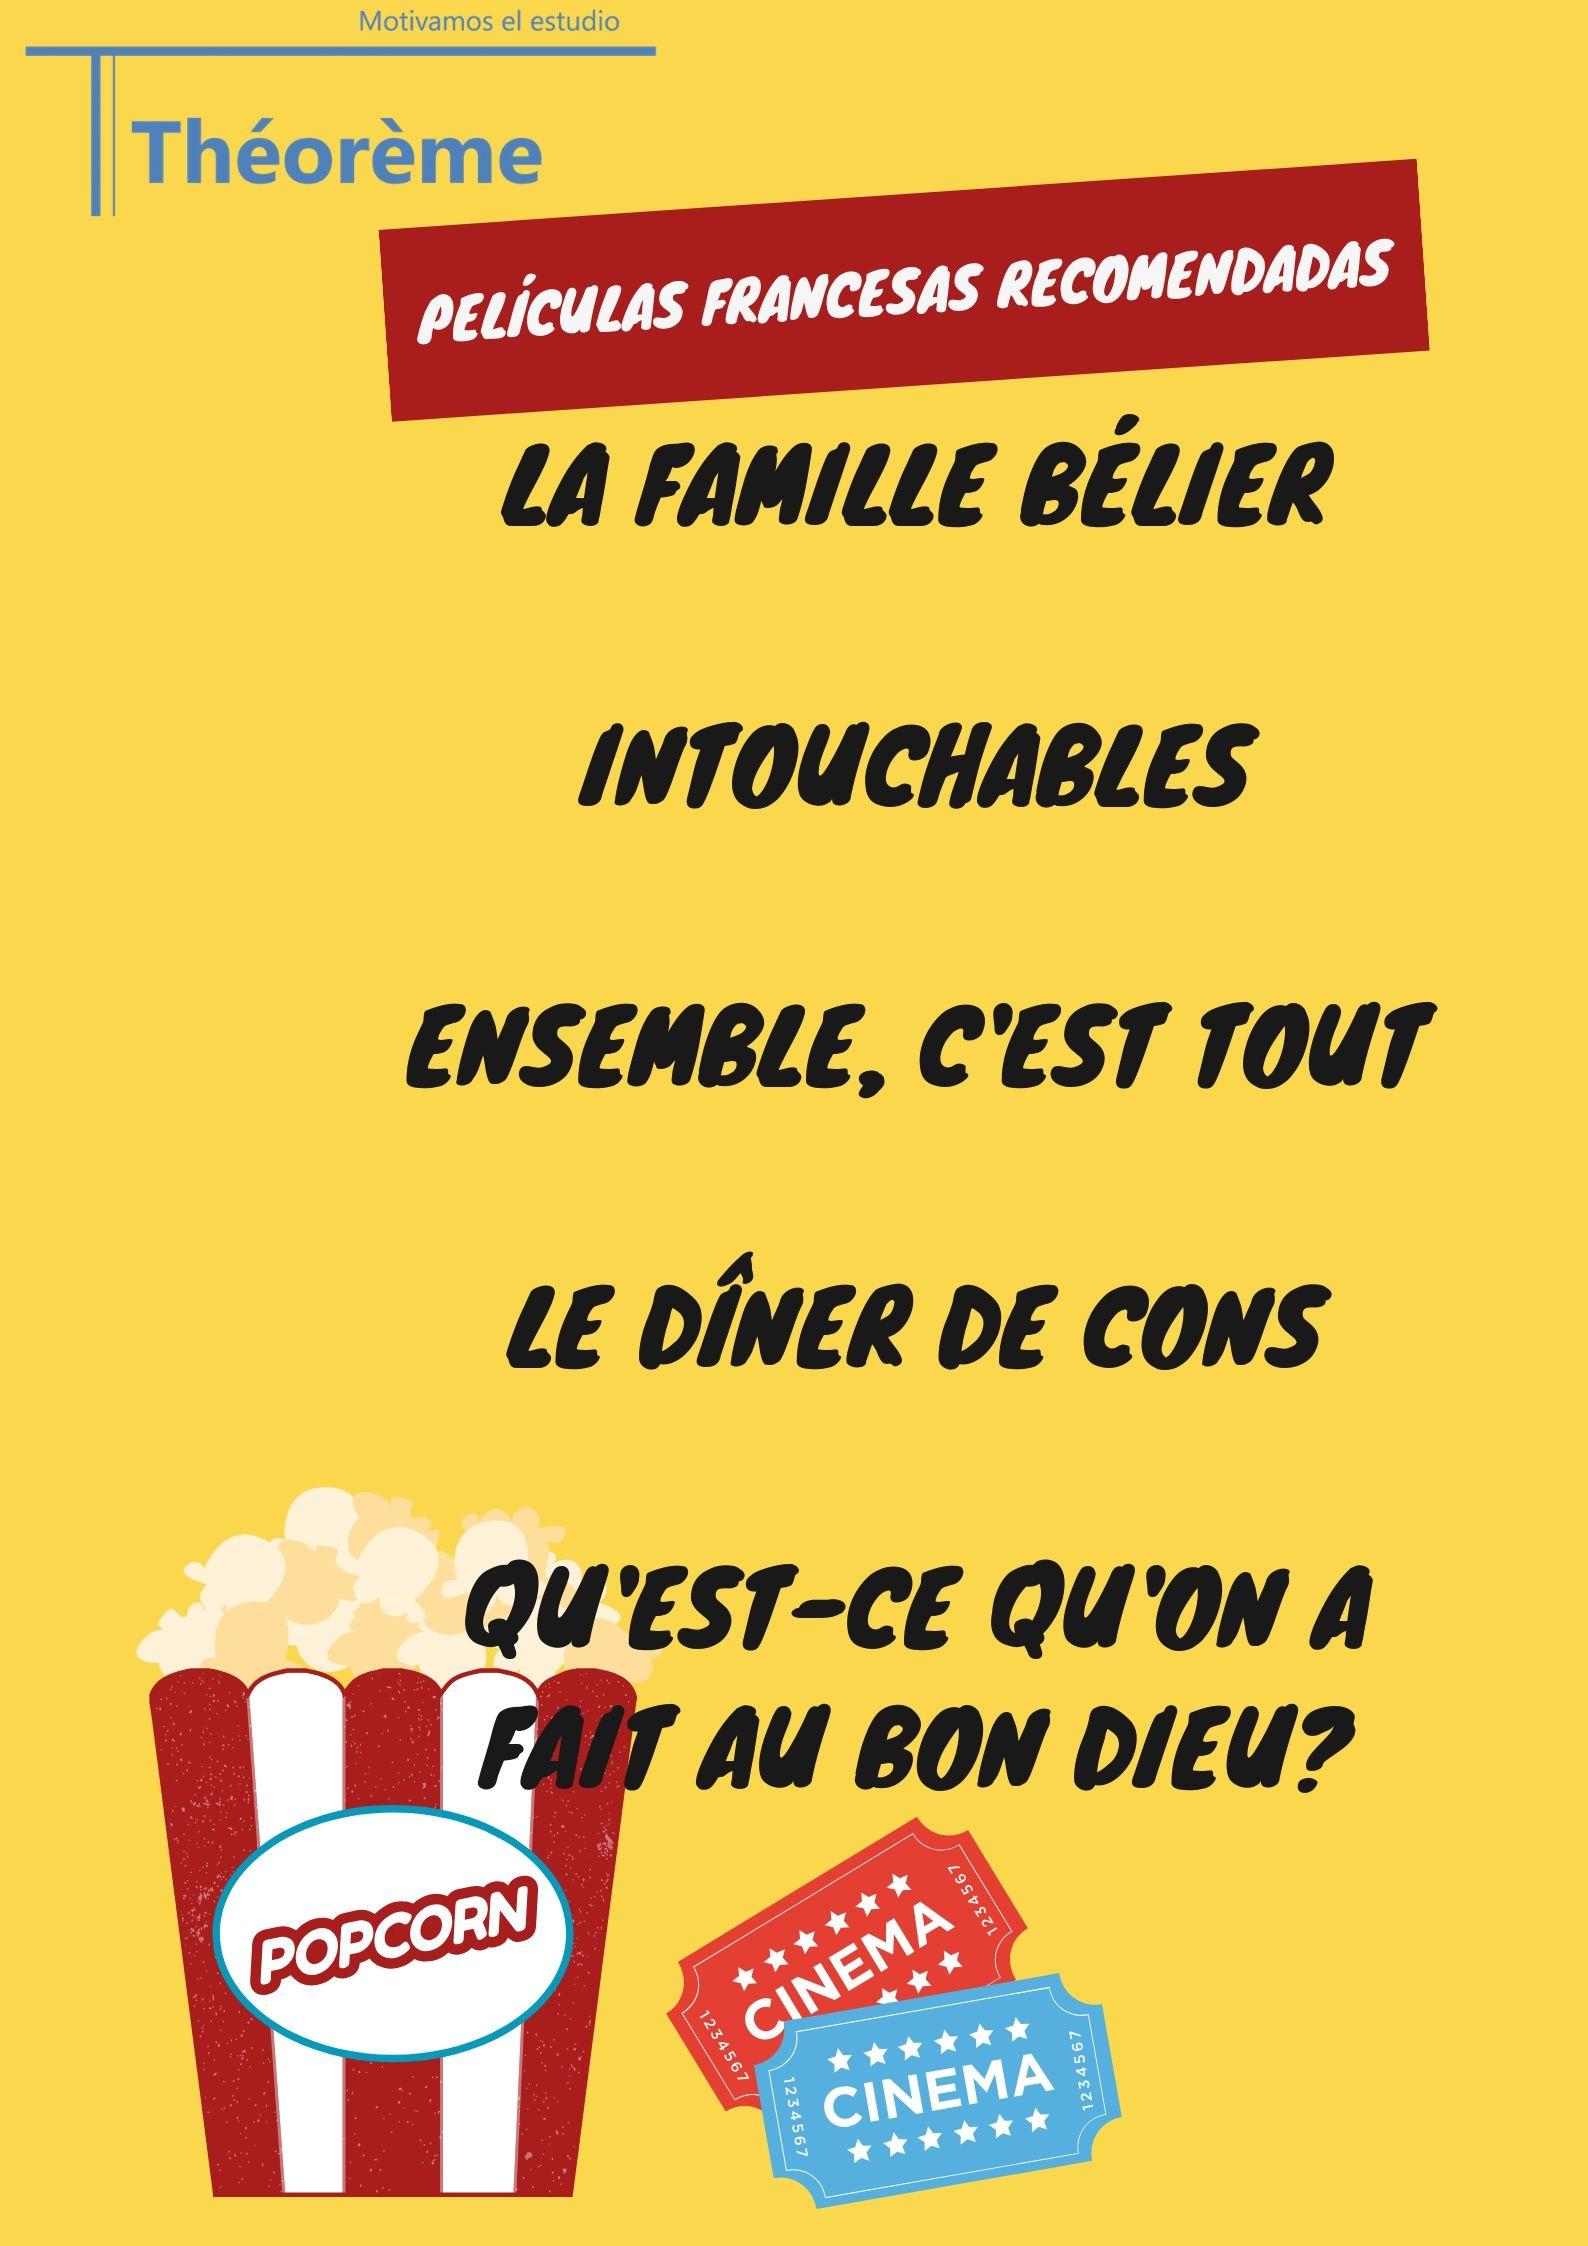 Películas francesas recomendadas